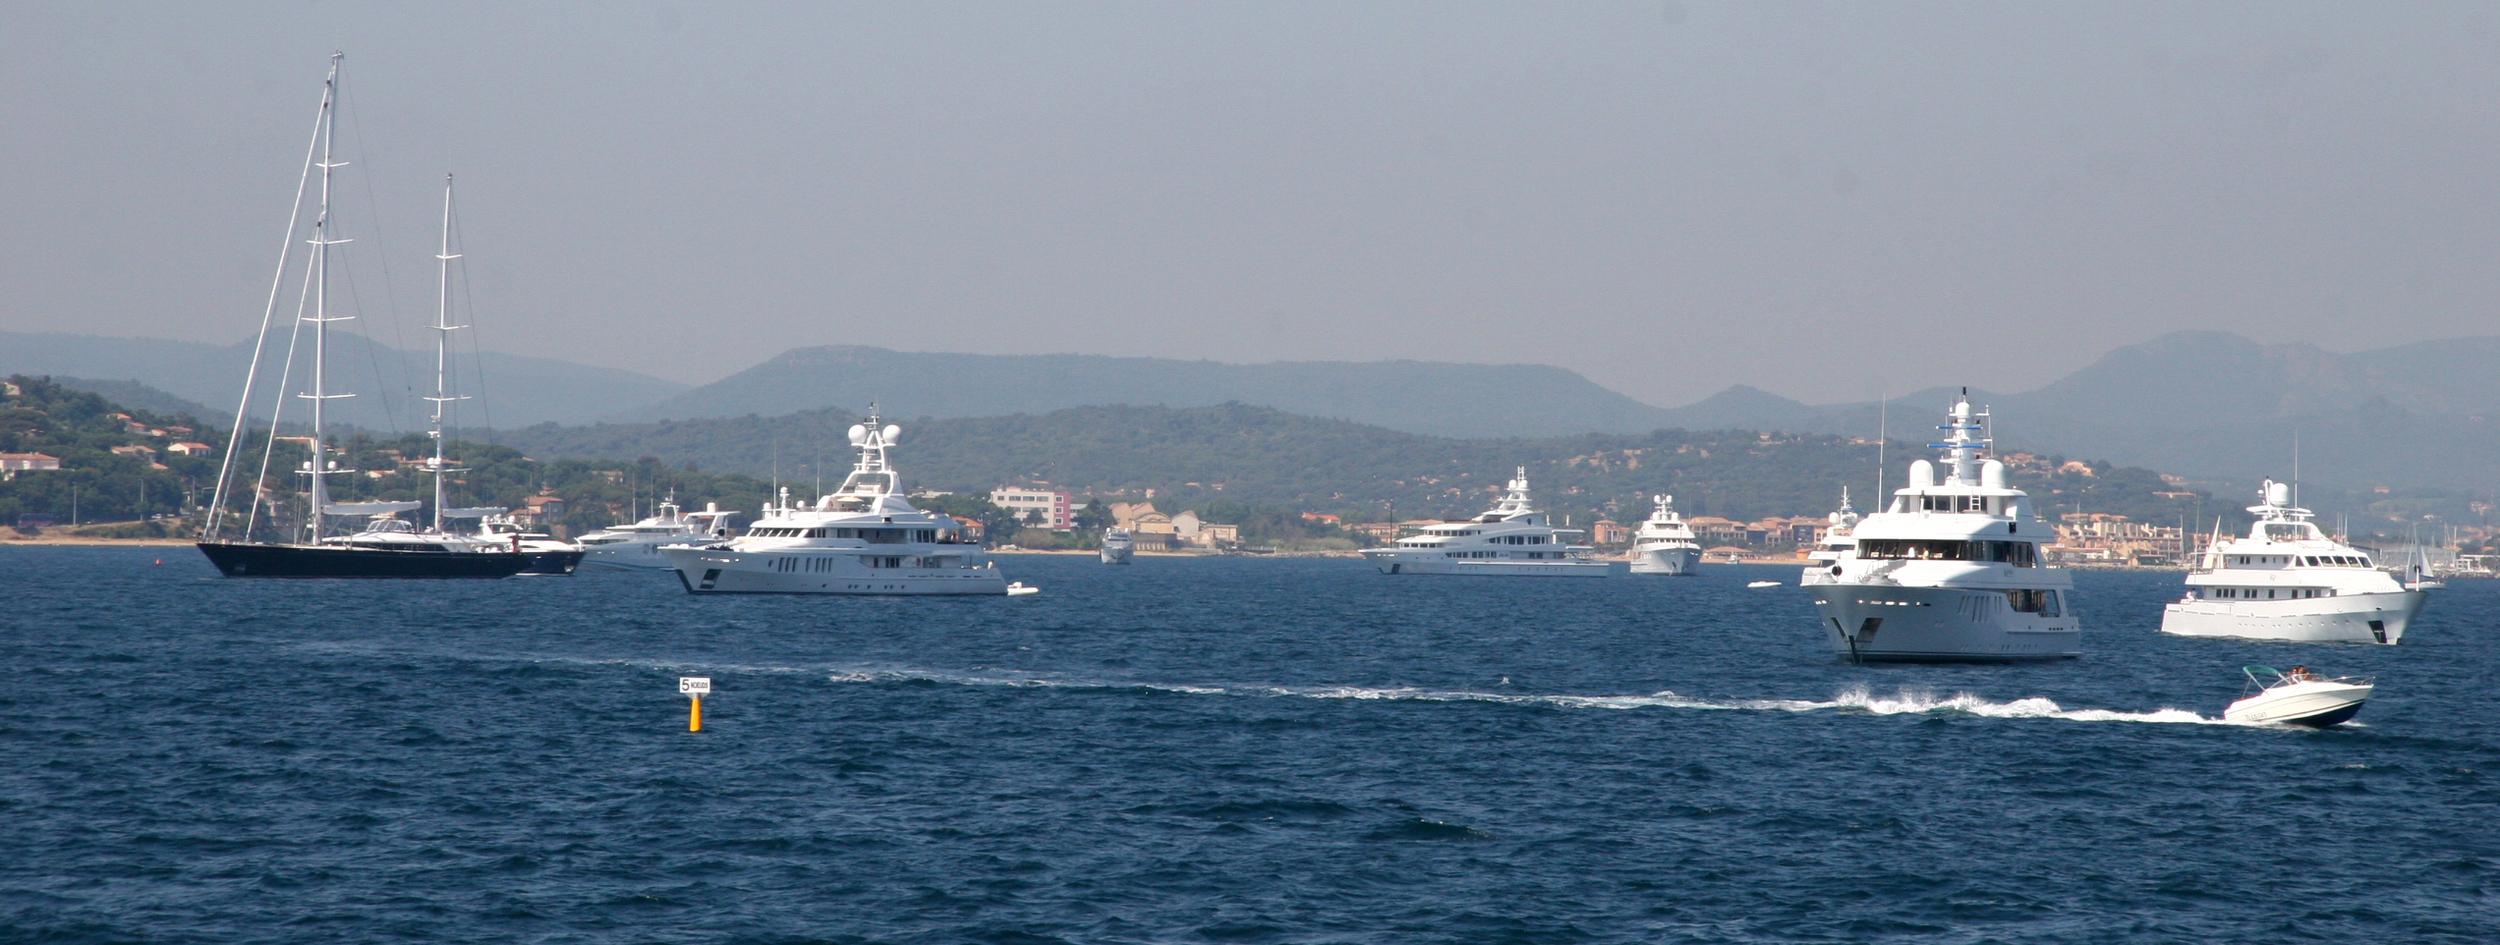 MV #2.3 - St Tropez - Cannes 014.jpg